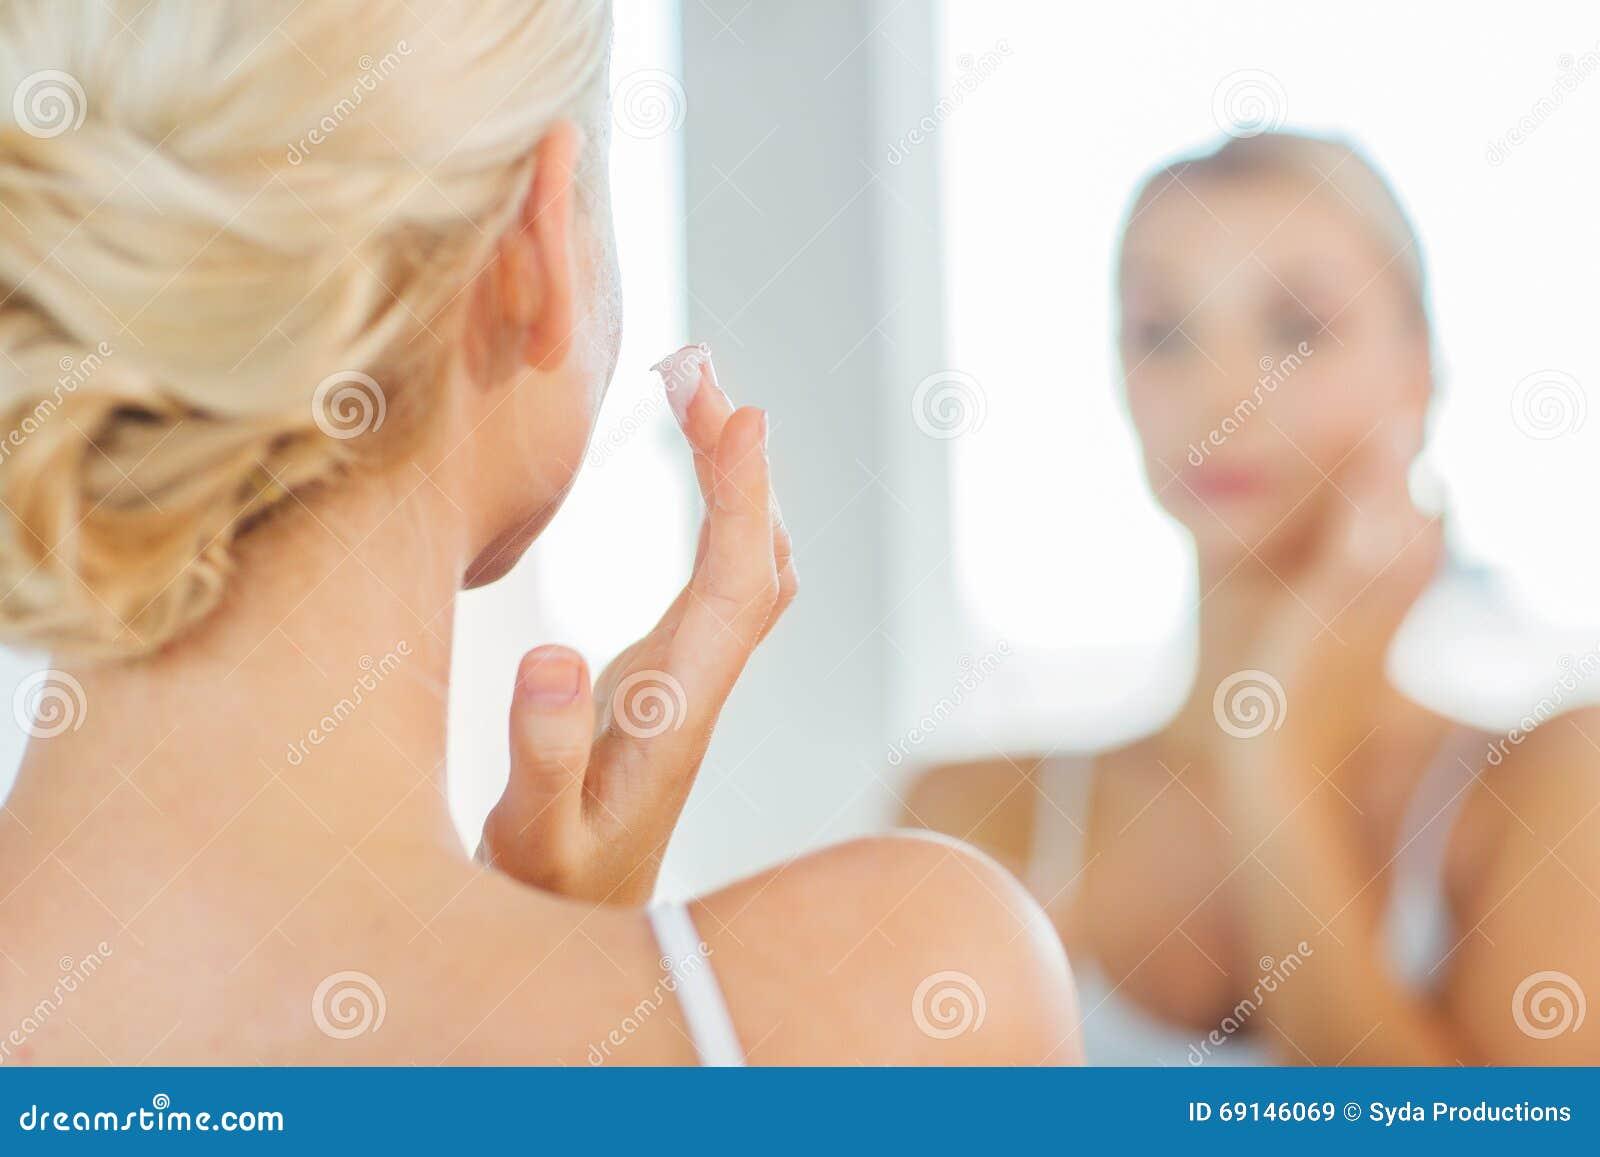 Close up of woman applying face cream at bathroom